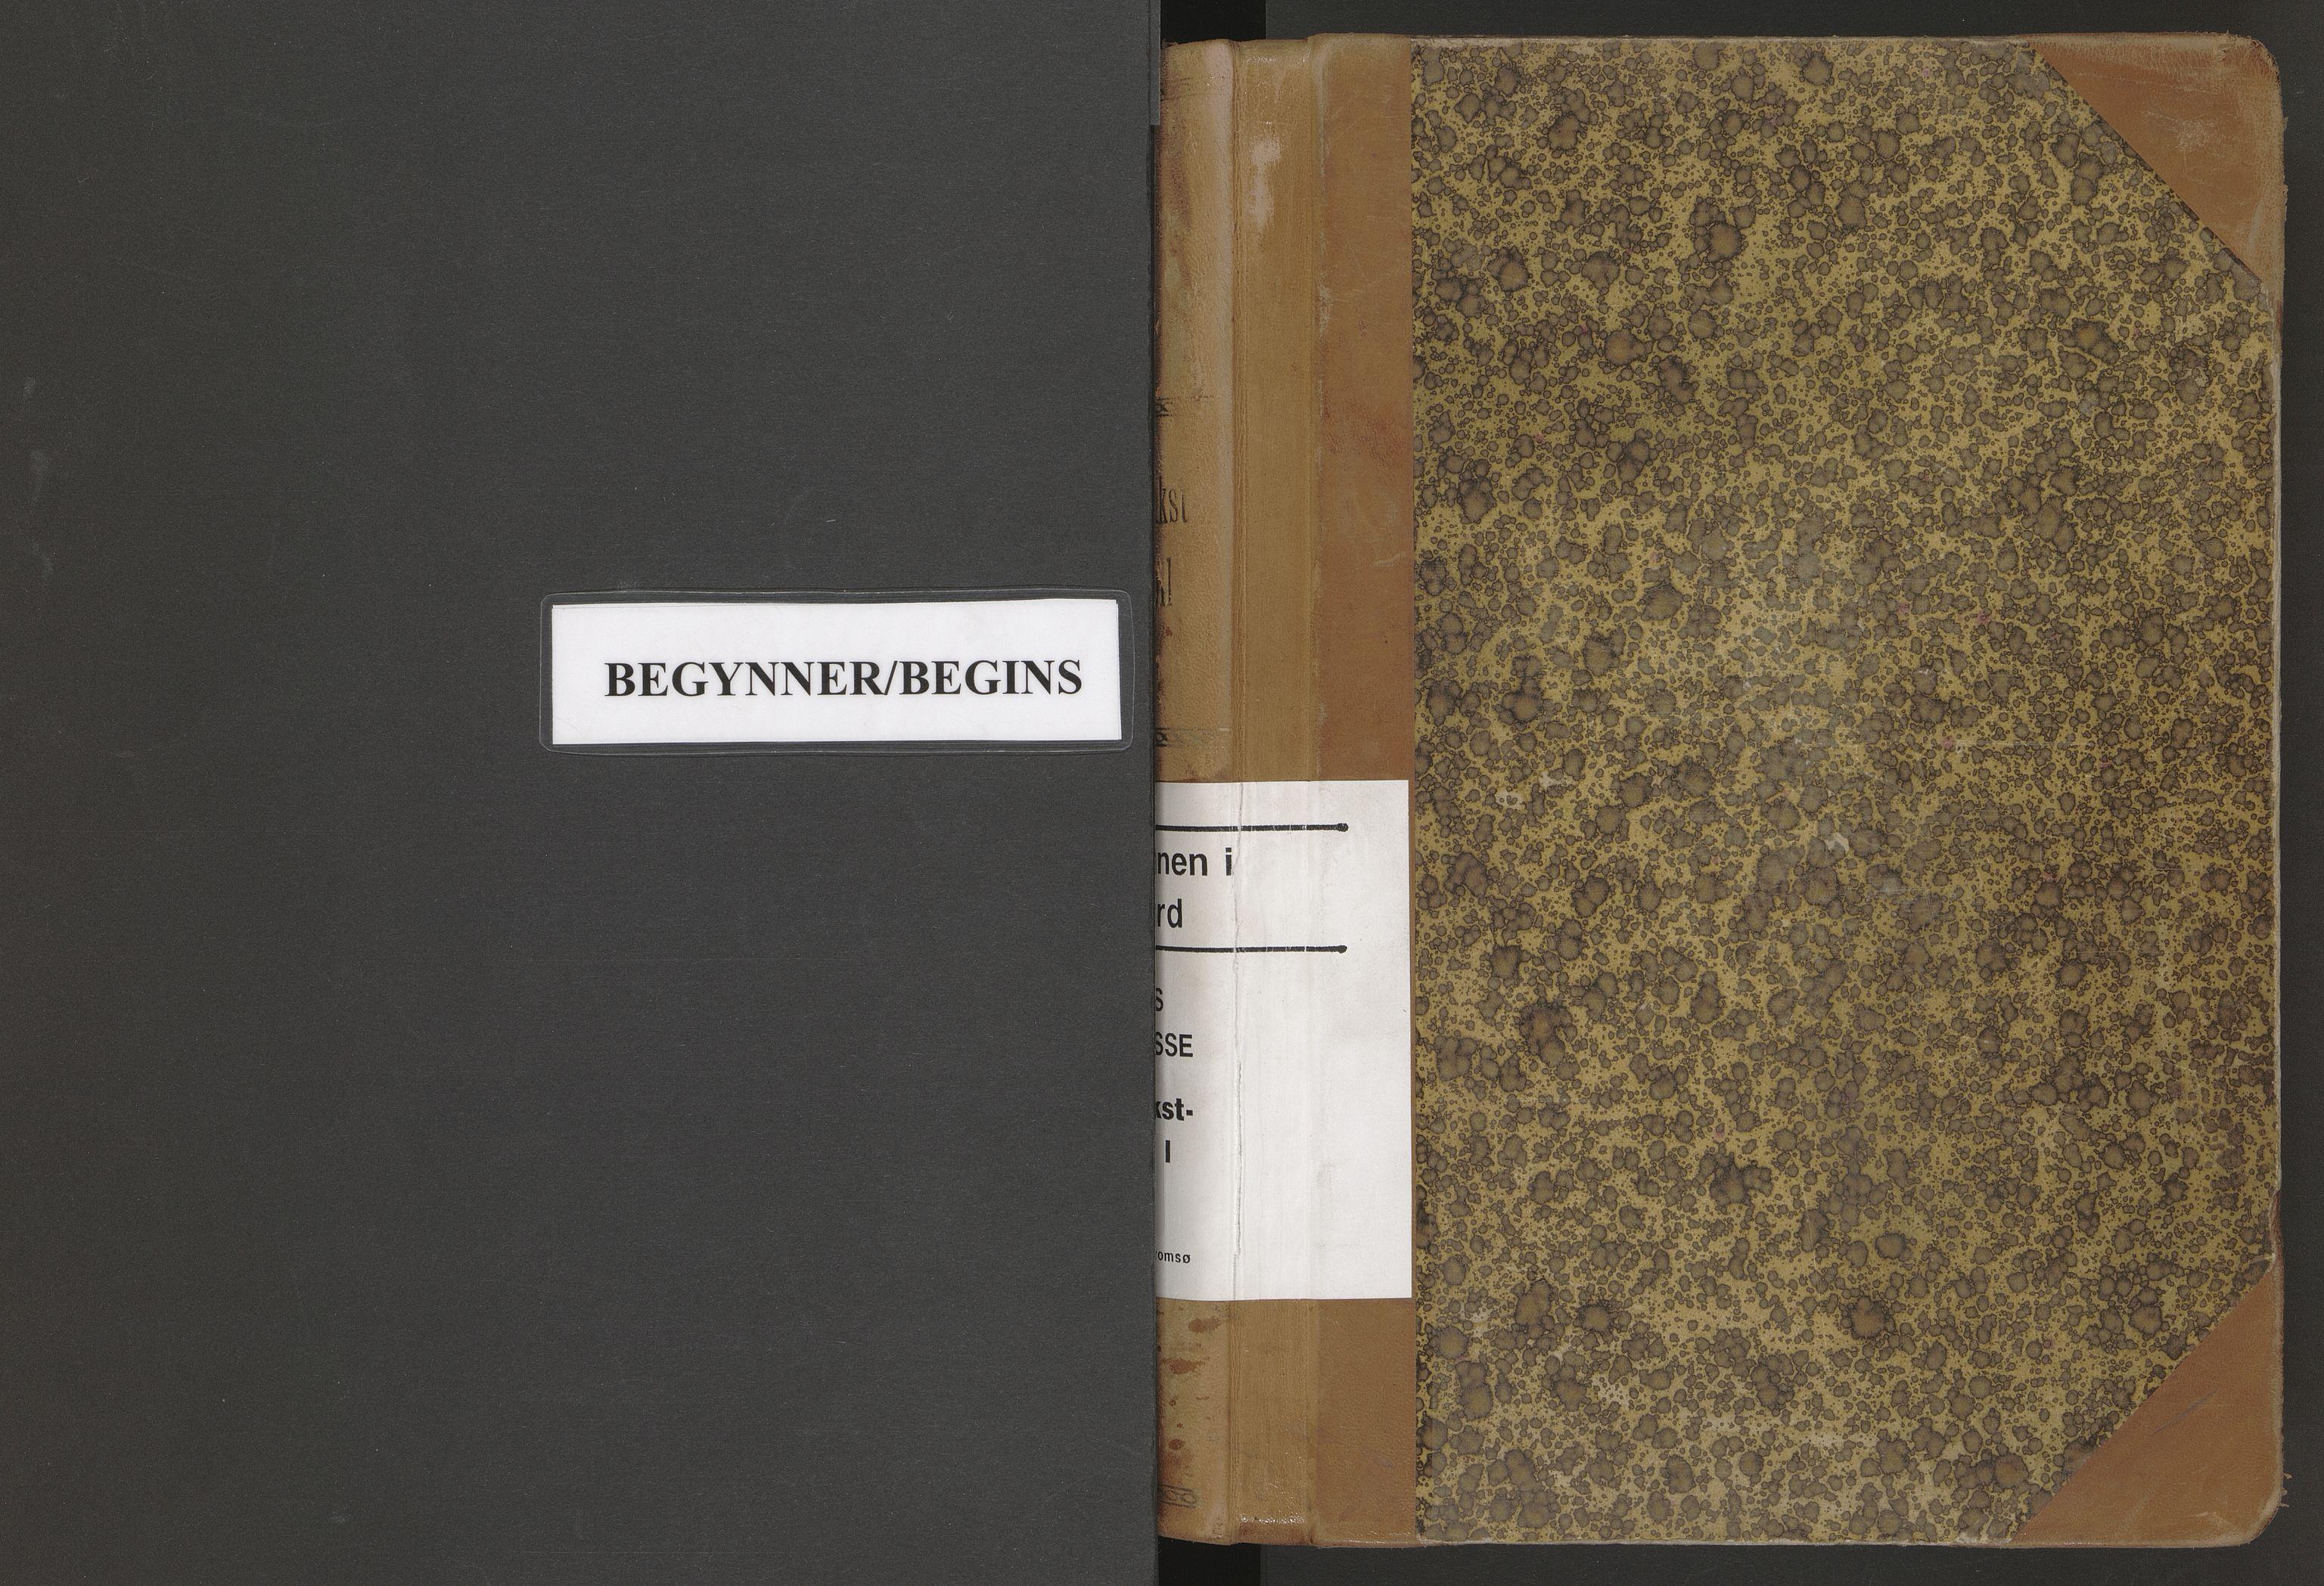 SATØ, Lensmannen i Balsfjord, Hf/Hfb/L0191: Branntakstprotokoller 1873-1978. Med register, 1936-1937